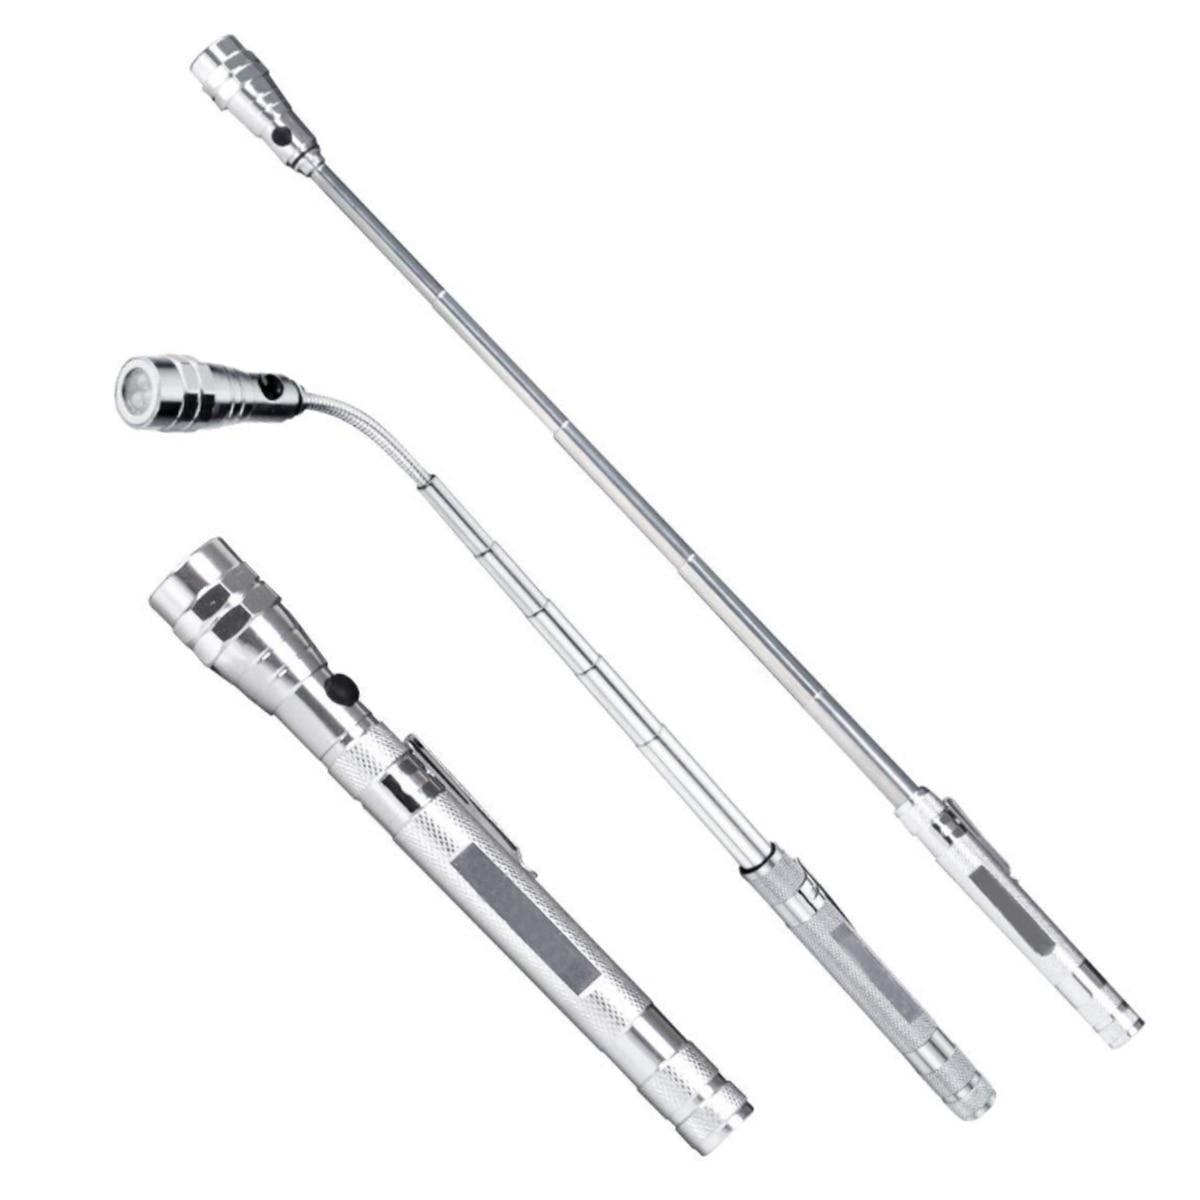 Portable Flashlight Flexible Head Flashlight  Telescopic Flexible 3 LED Torch Lamp Bottom Double Magnet Dead Angle Nemesis